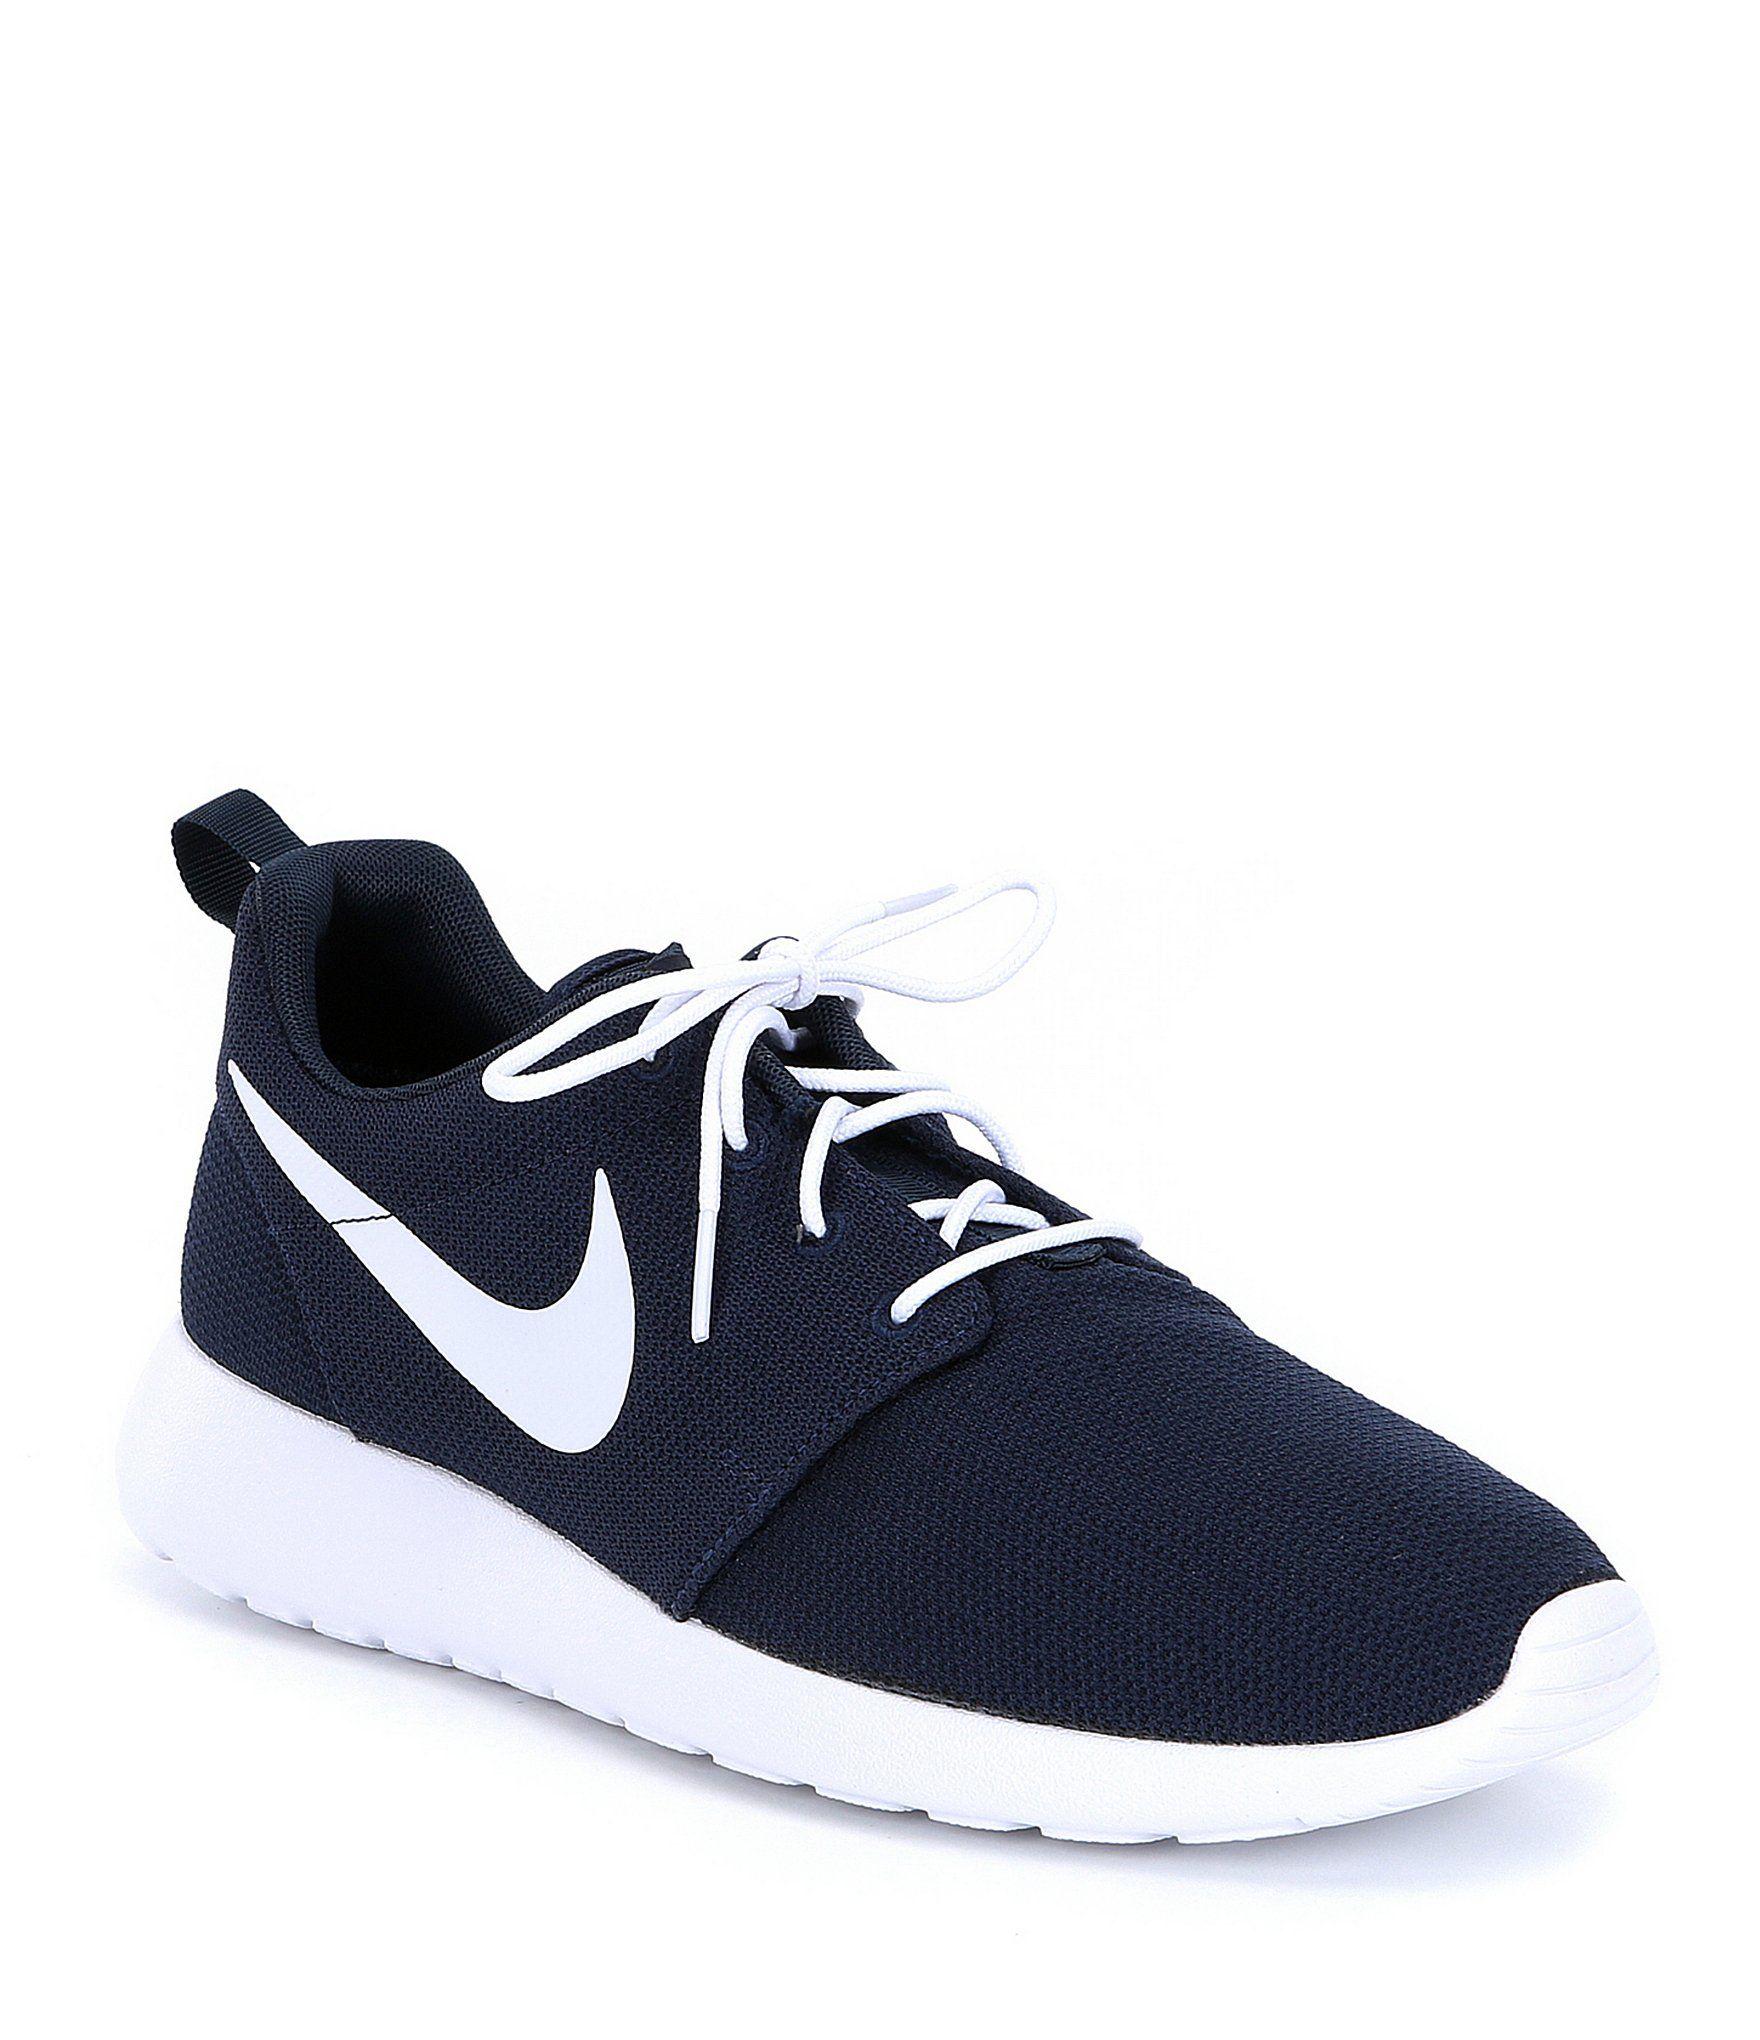 Mens fashion nike, Nike shoes, Nike